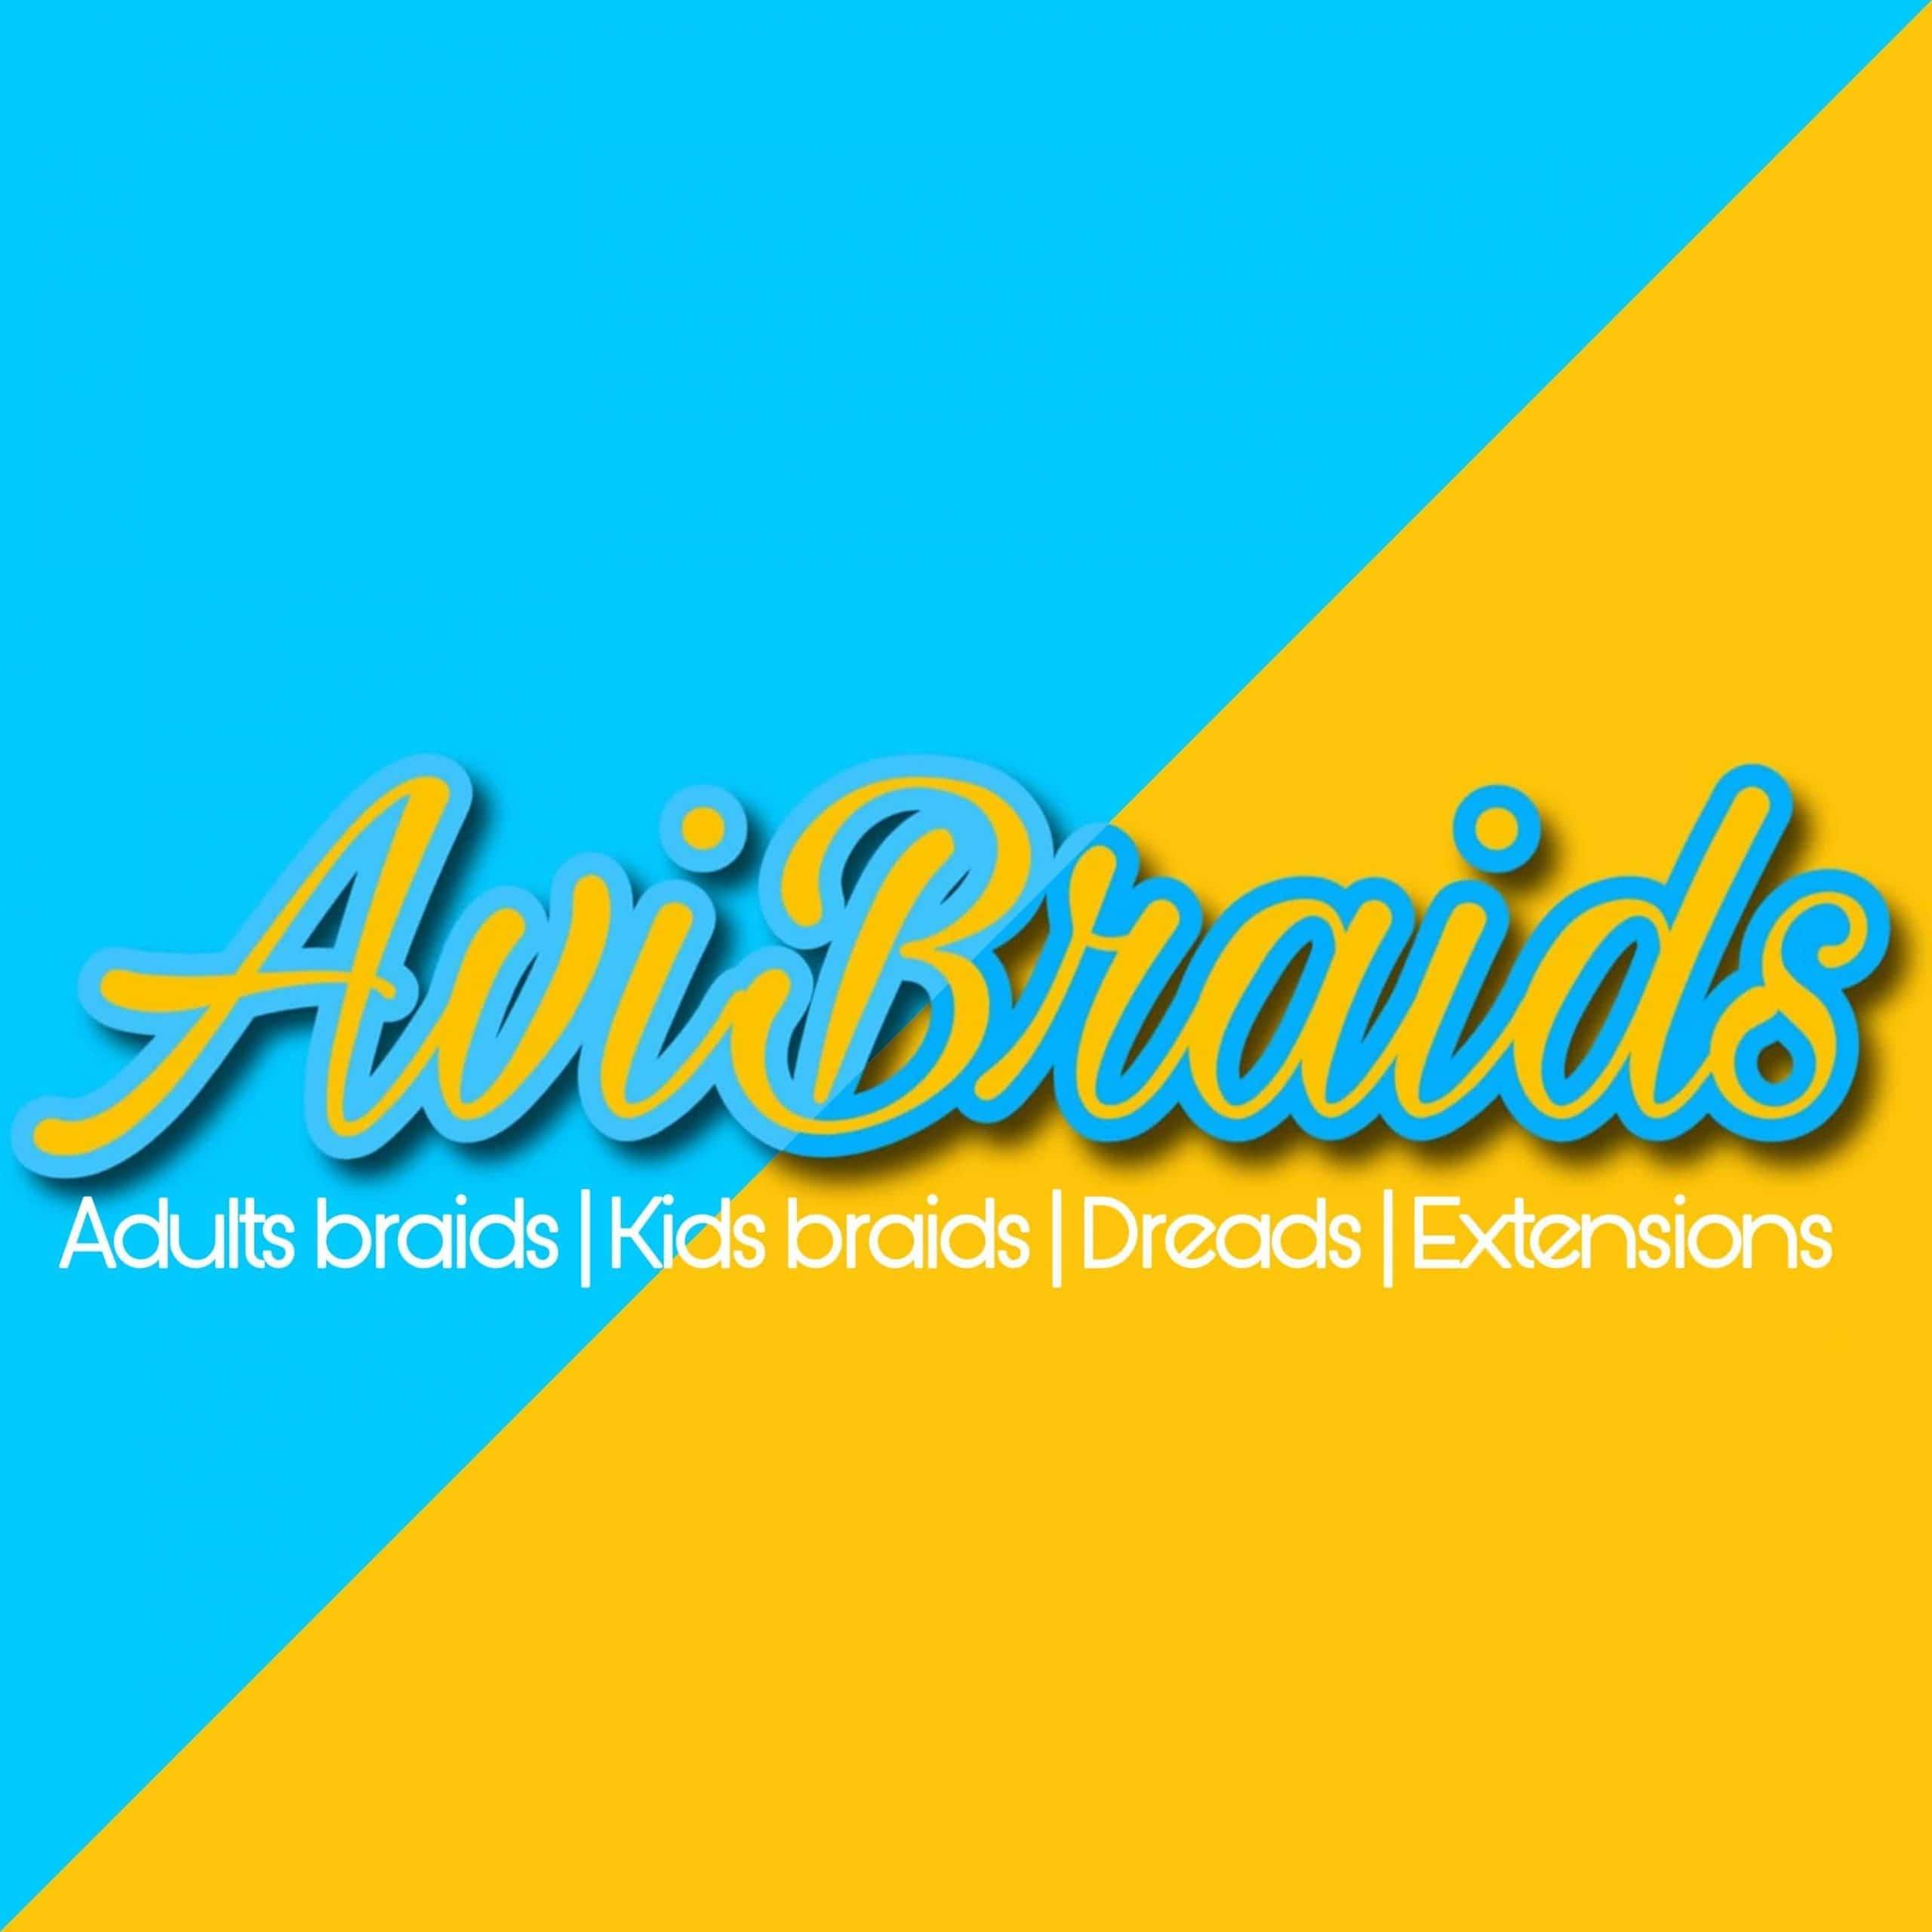 Avibraids